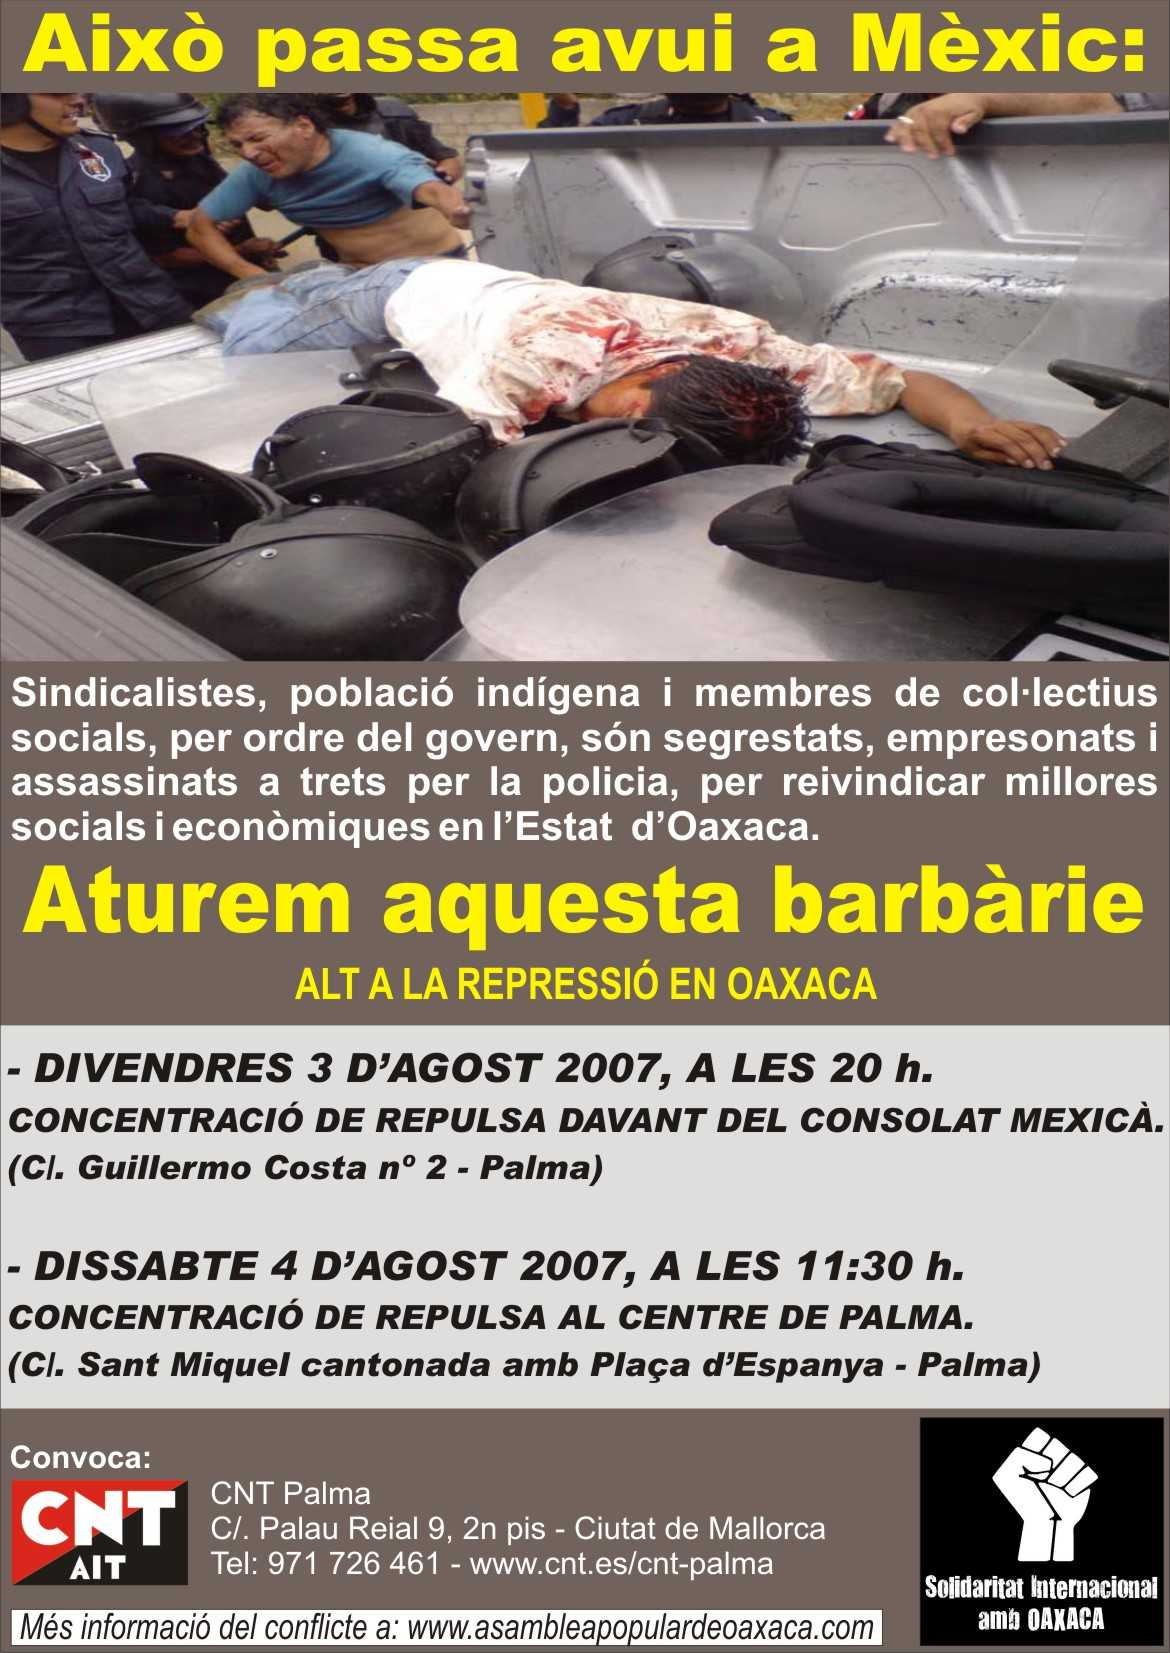 Això passa avui a Mèxic!